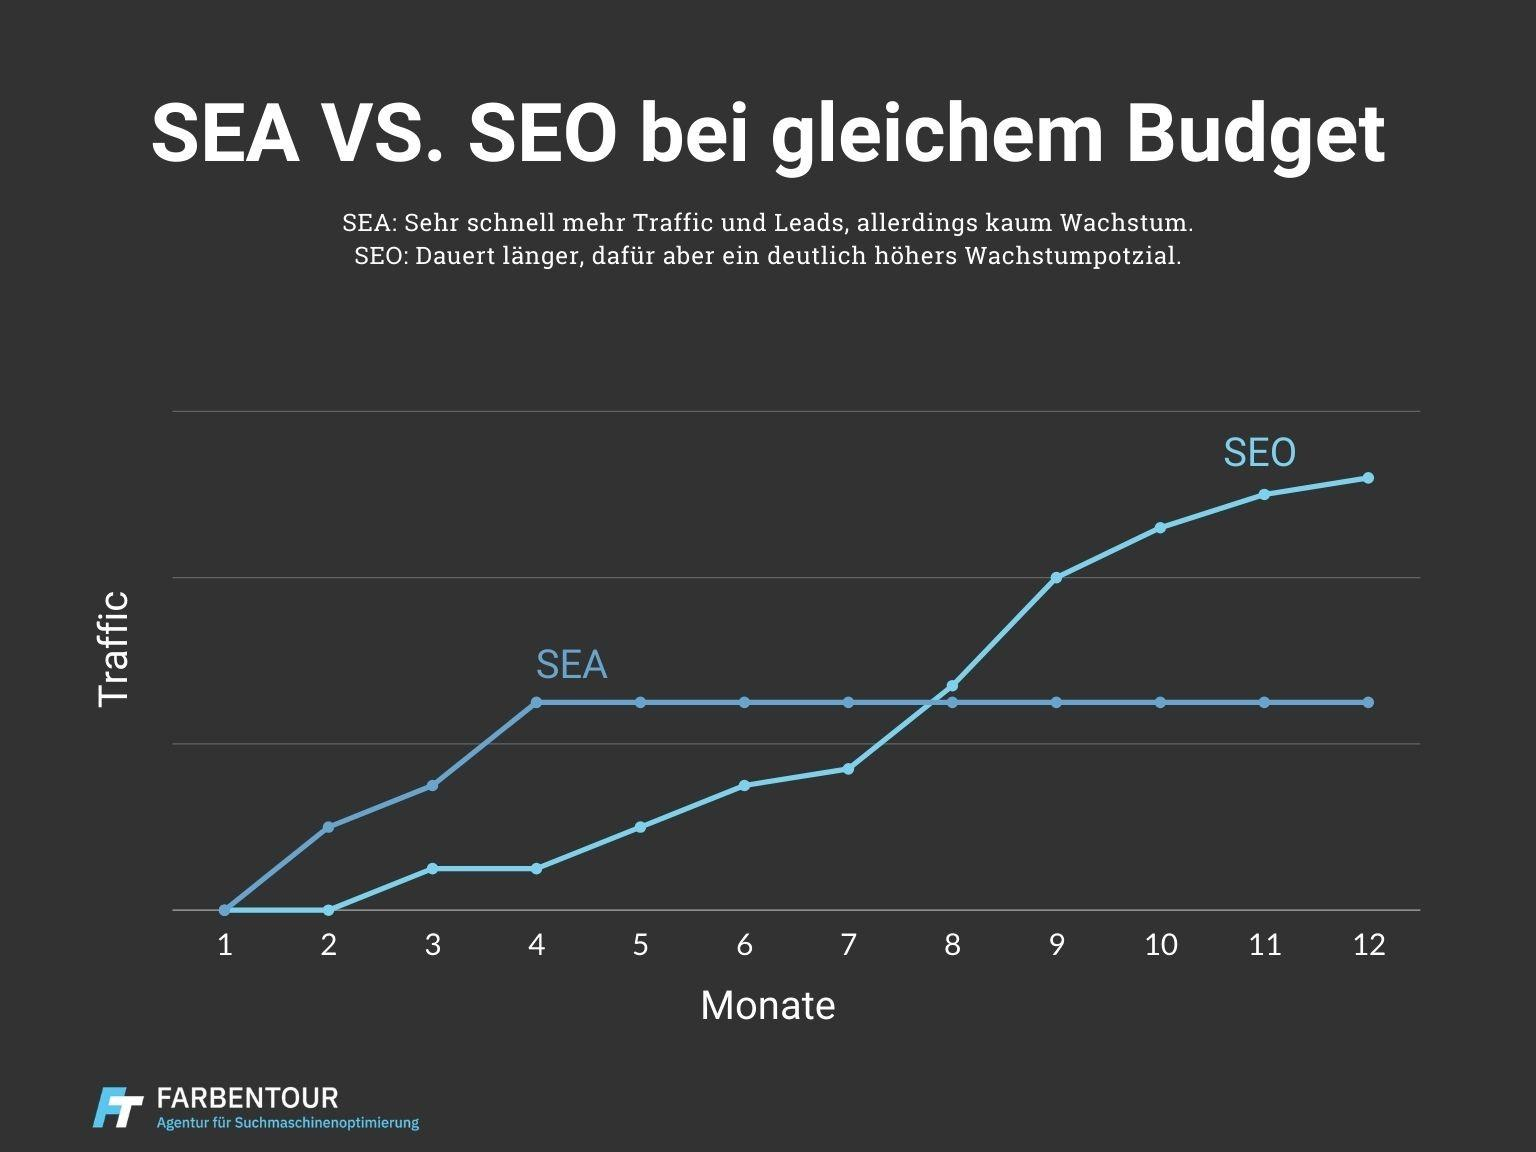 SEA vs SEO Budget Vergleich